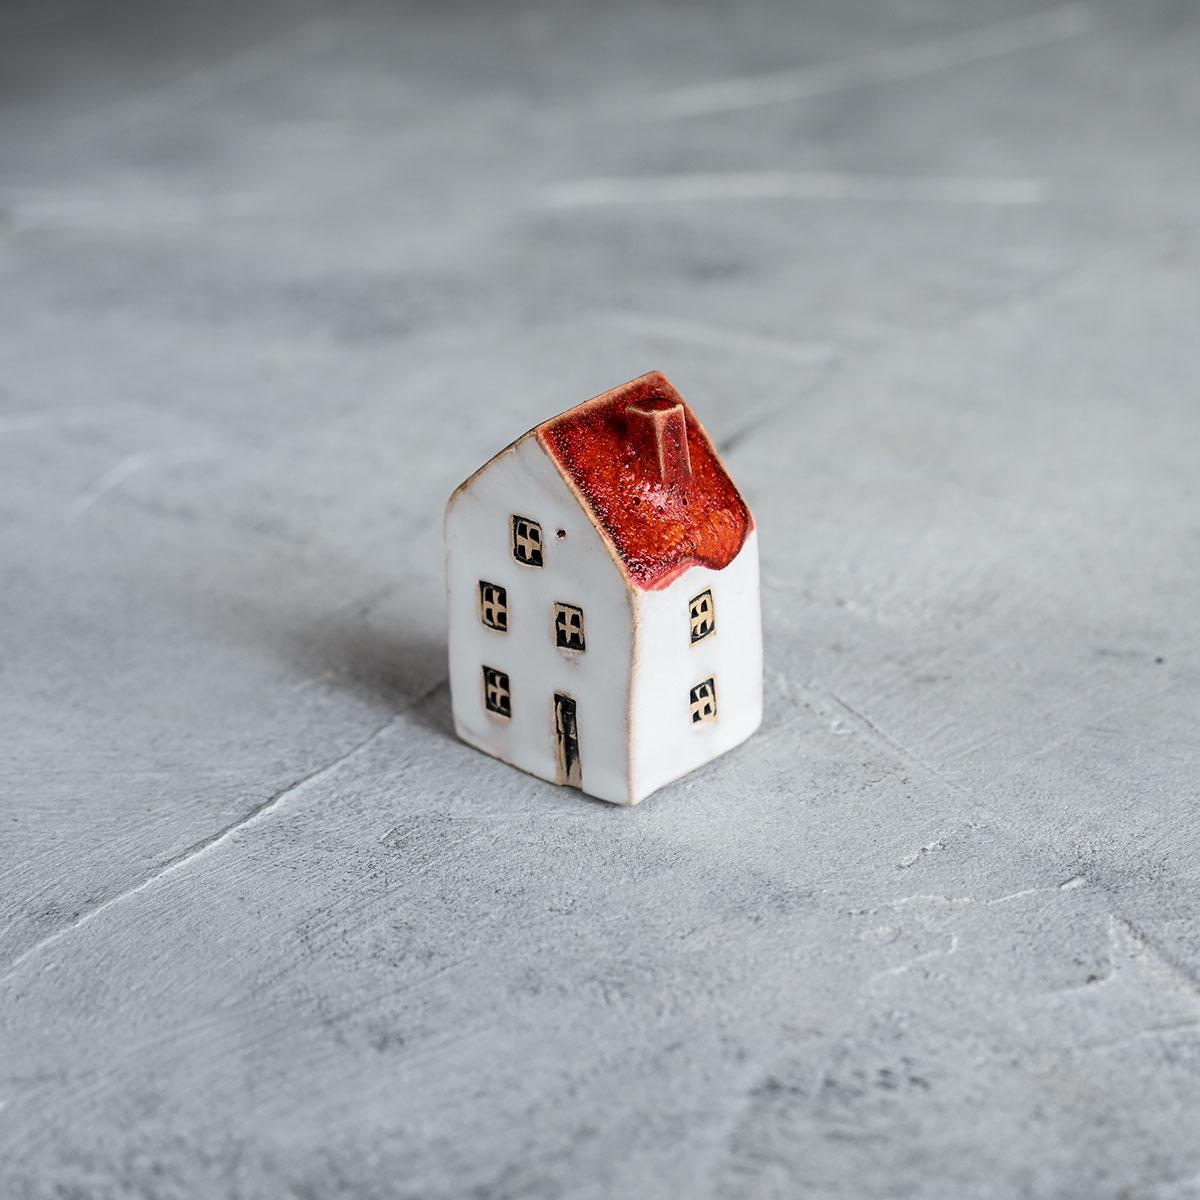 картинка Маленький декоративный домик 28 - DishWishes.Ru